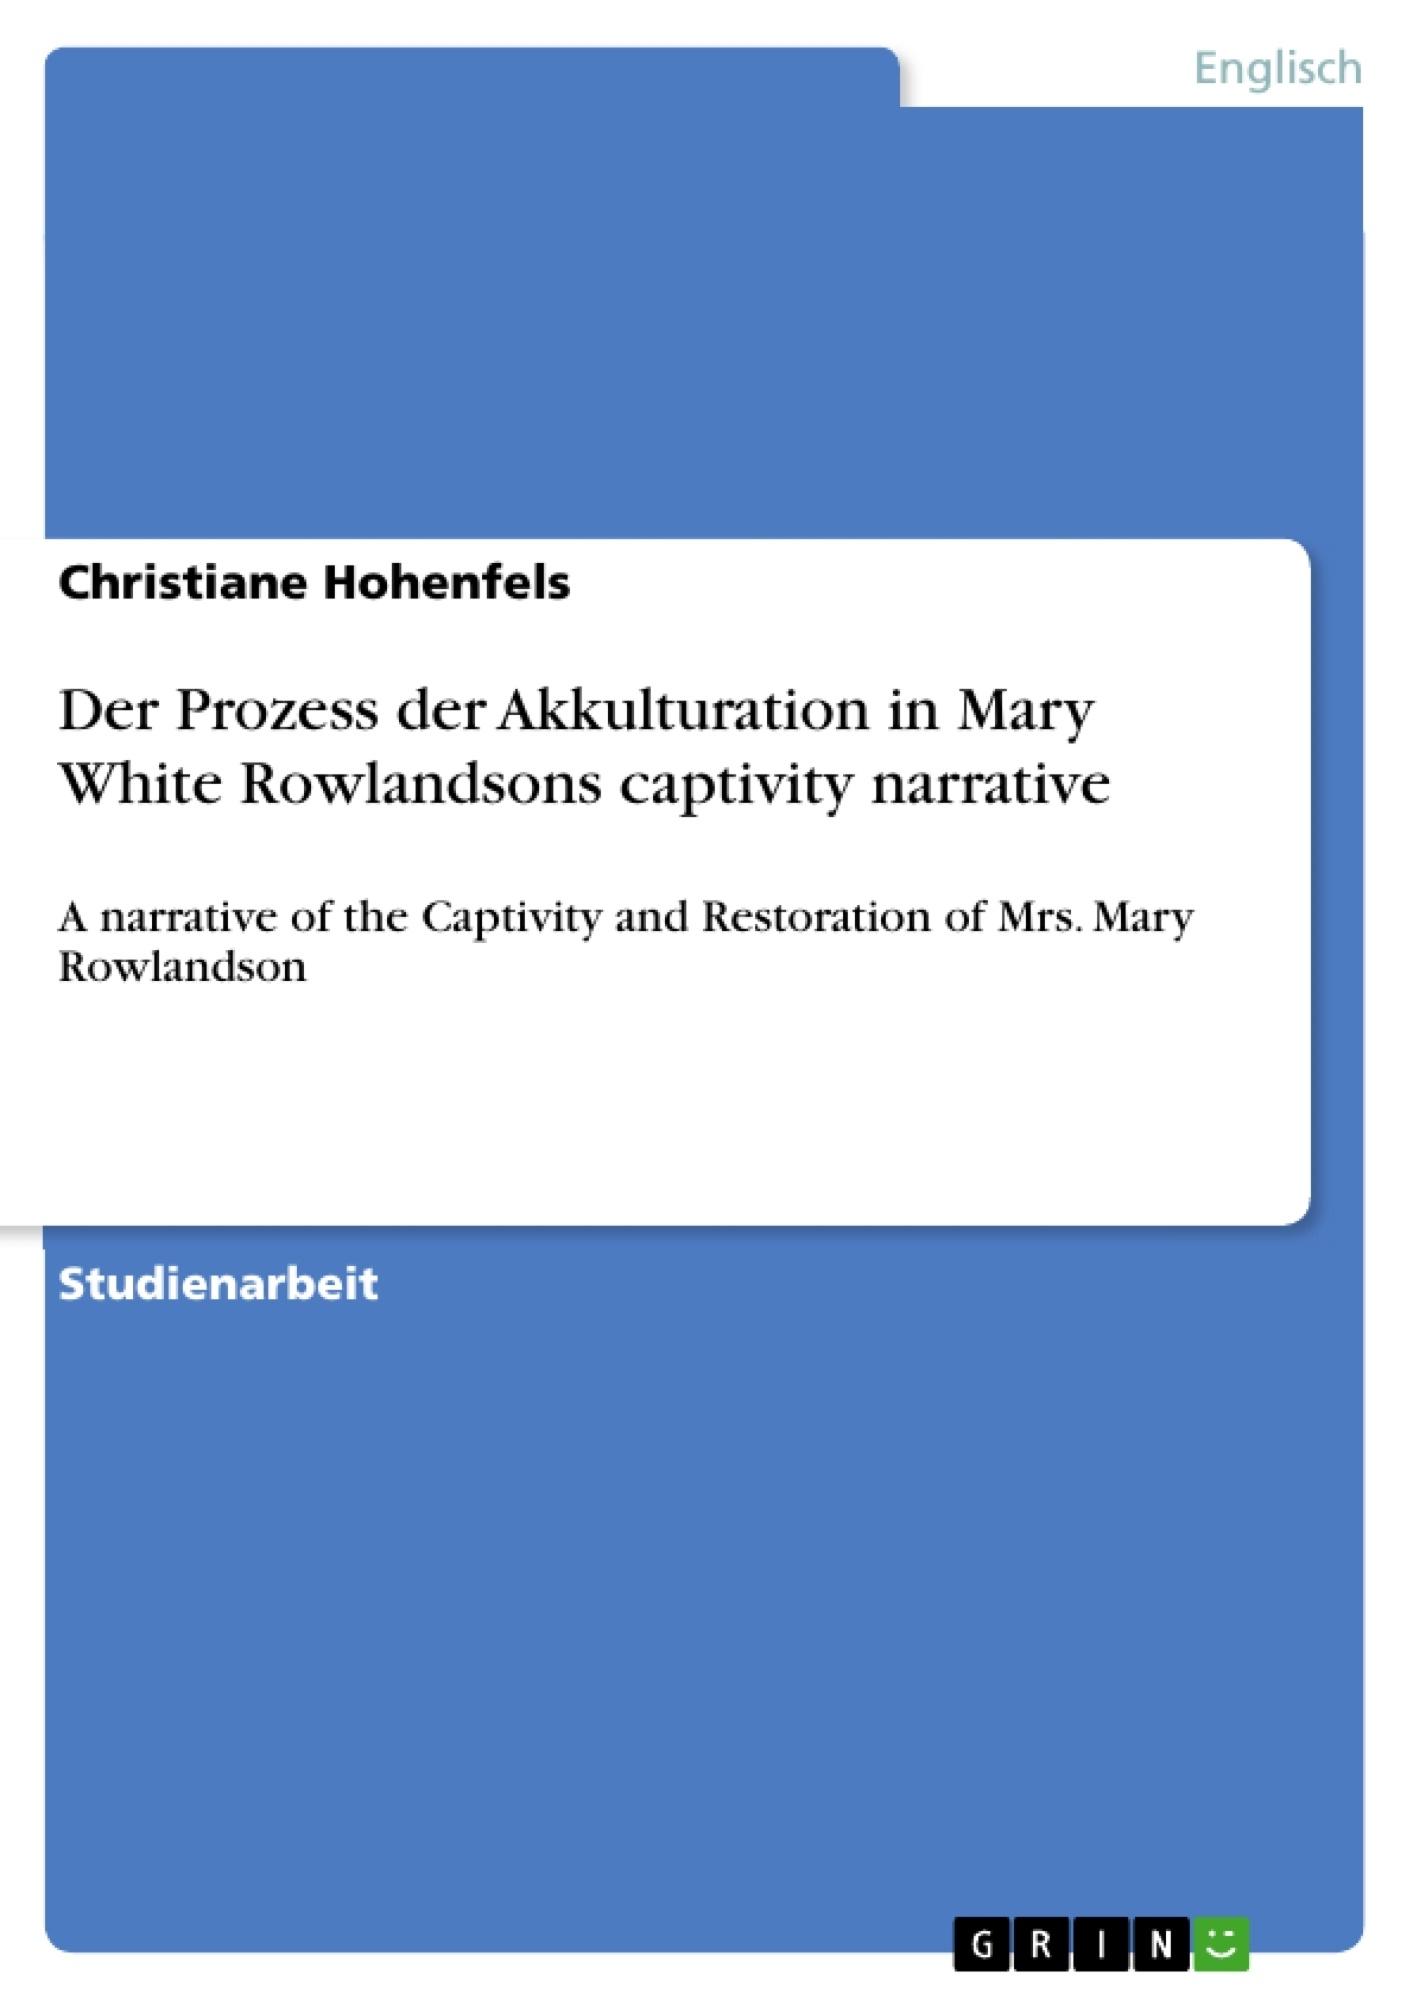 Titel: Der Prozess der Akkulturation in Mary White Rowlandsons captivity narrative